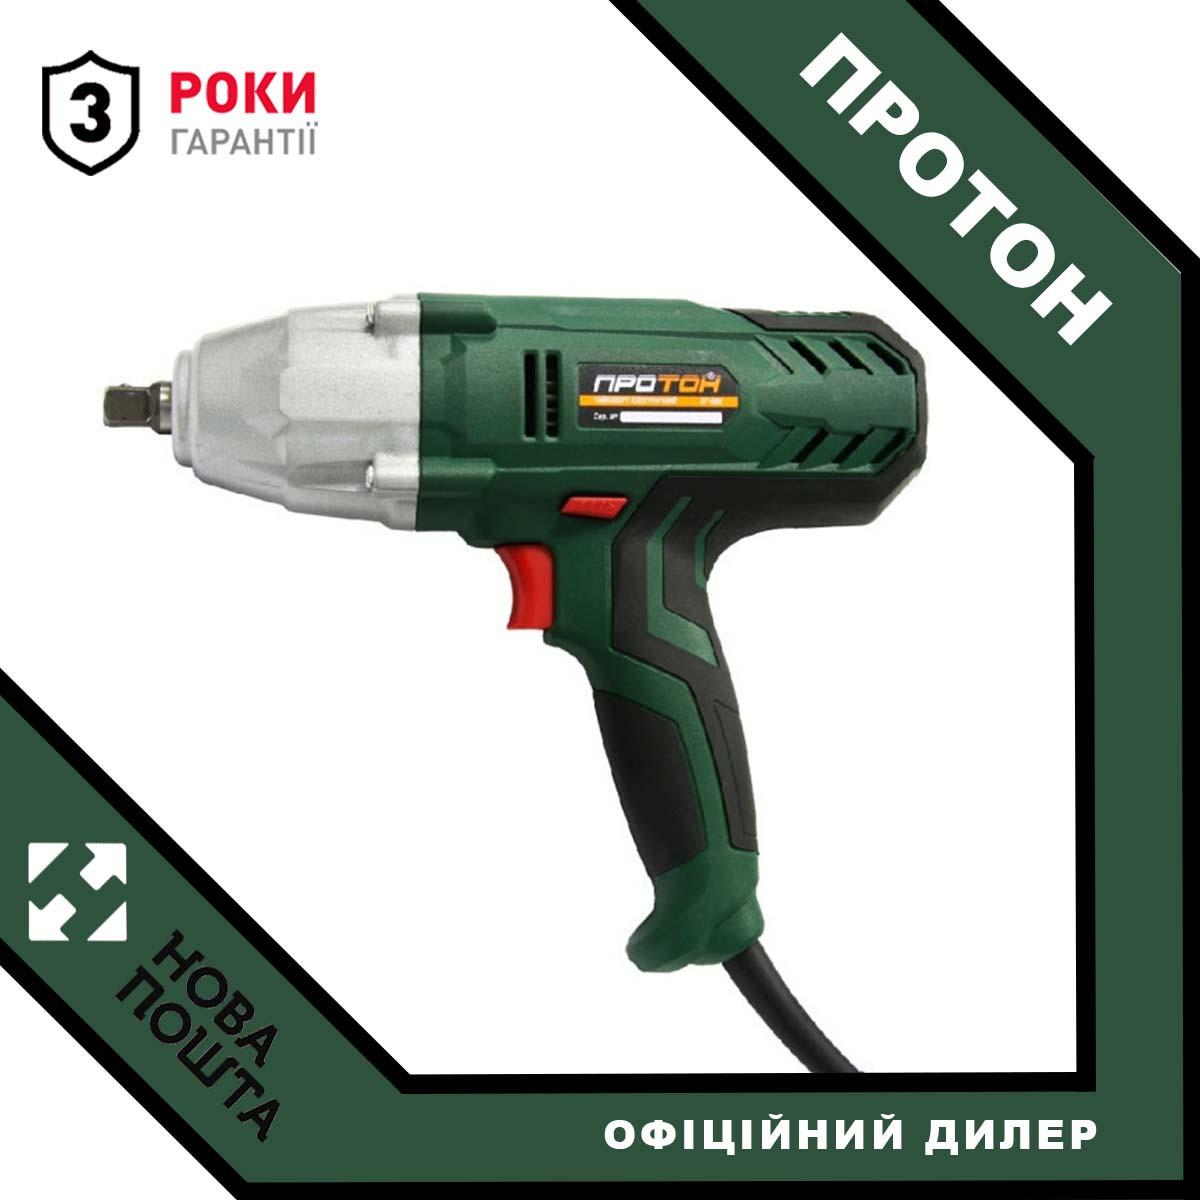 Гайковерт електричний Протон ЕГ-980